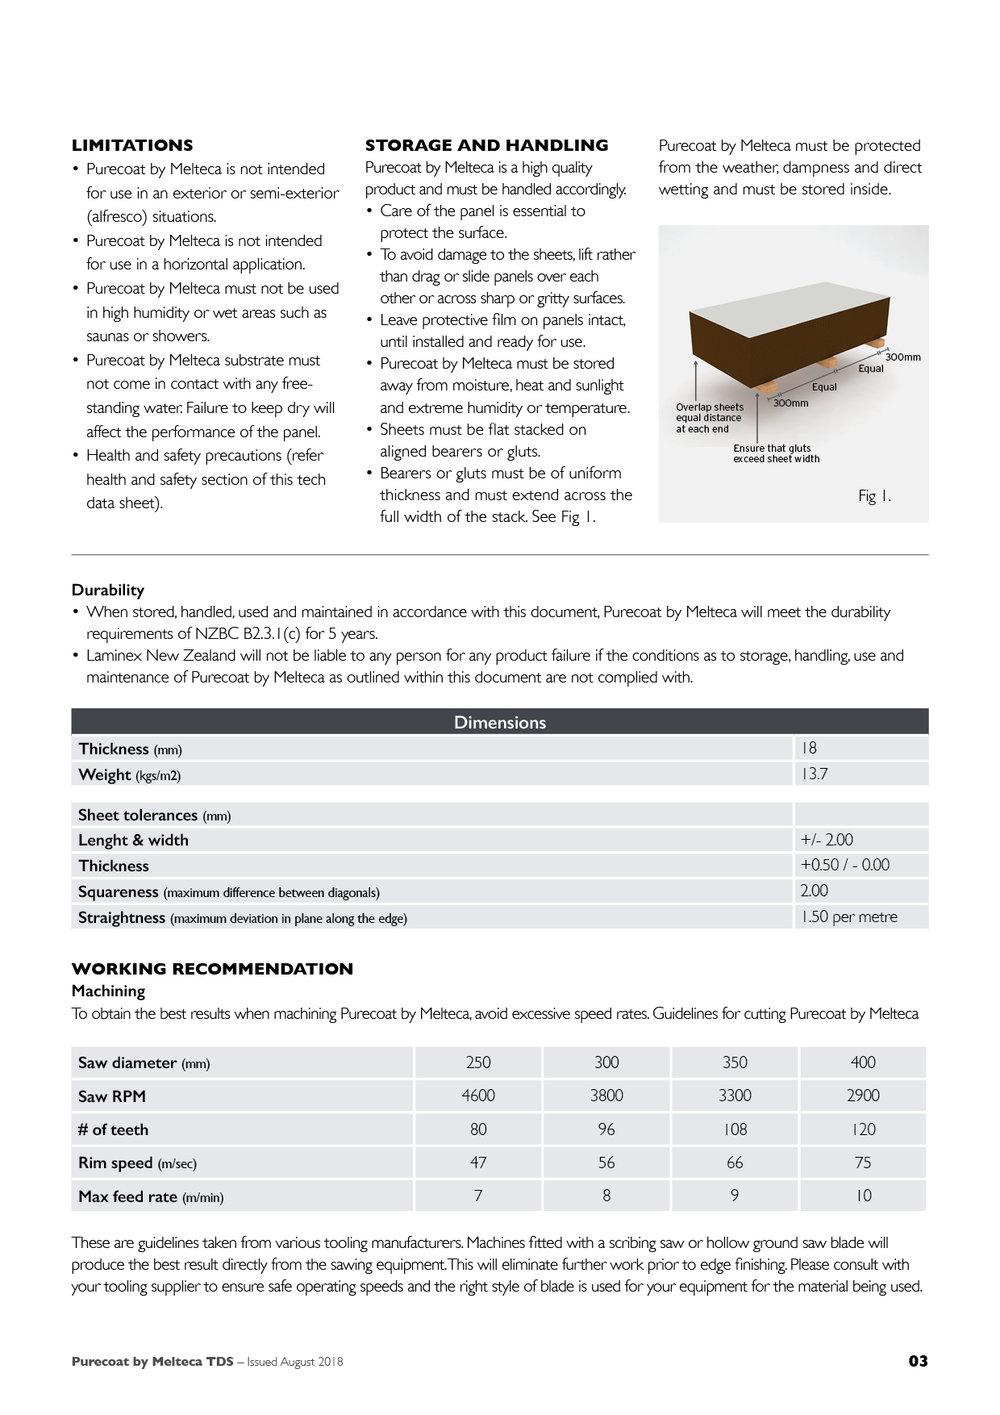 J007024 LAMI Melteca Purecoat Technical Data Sheet3.jpg